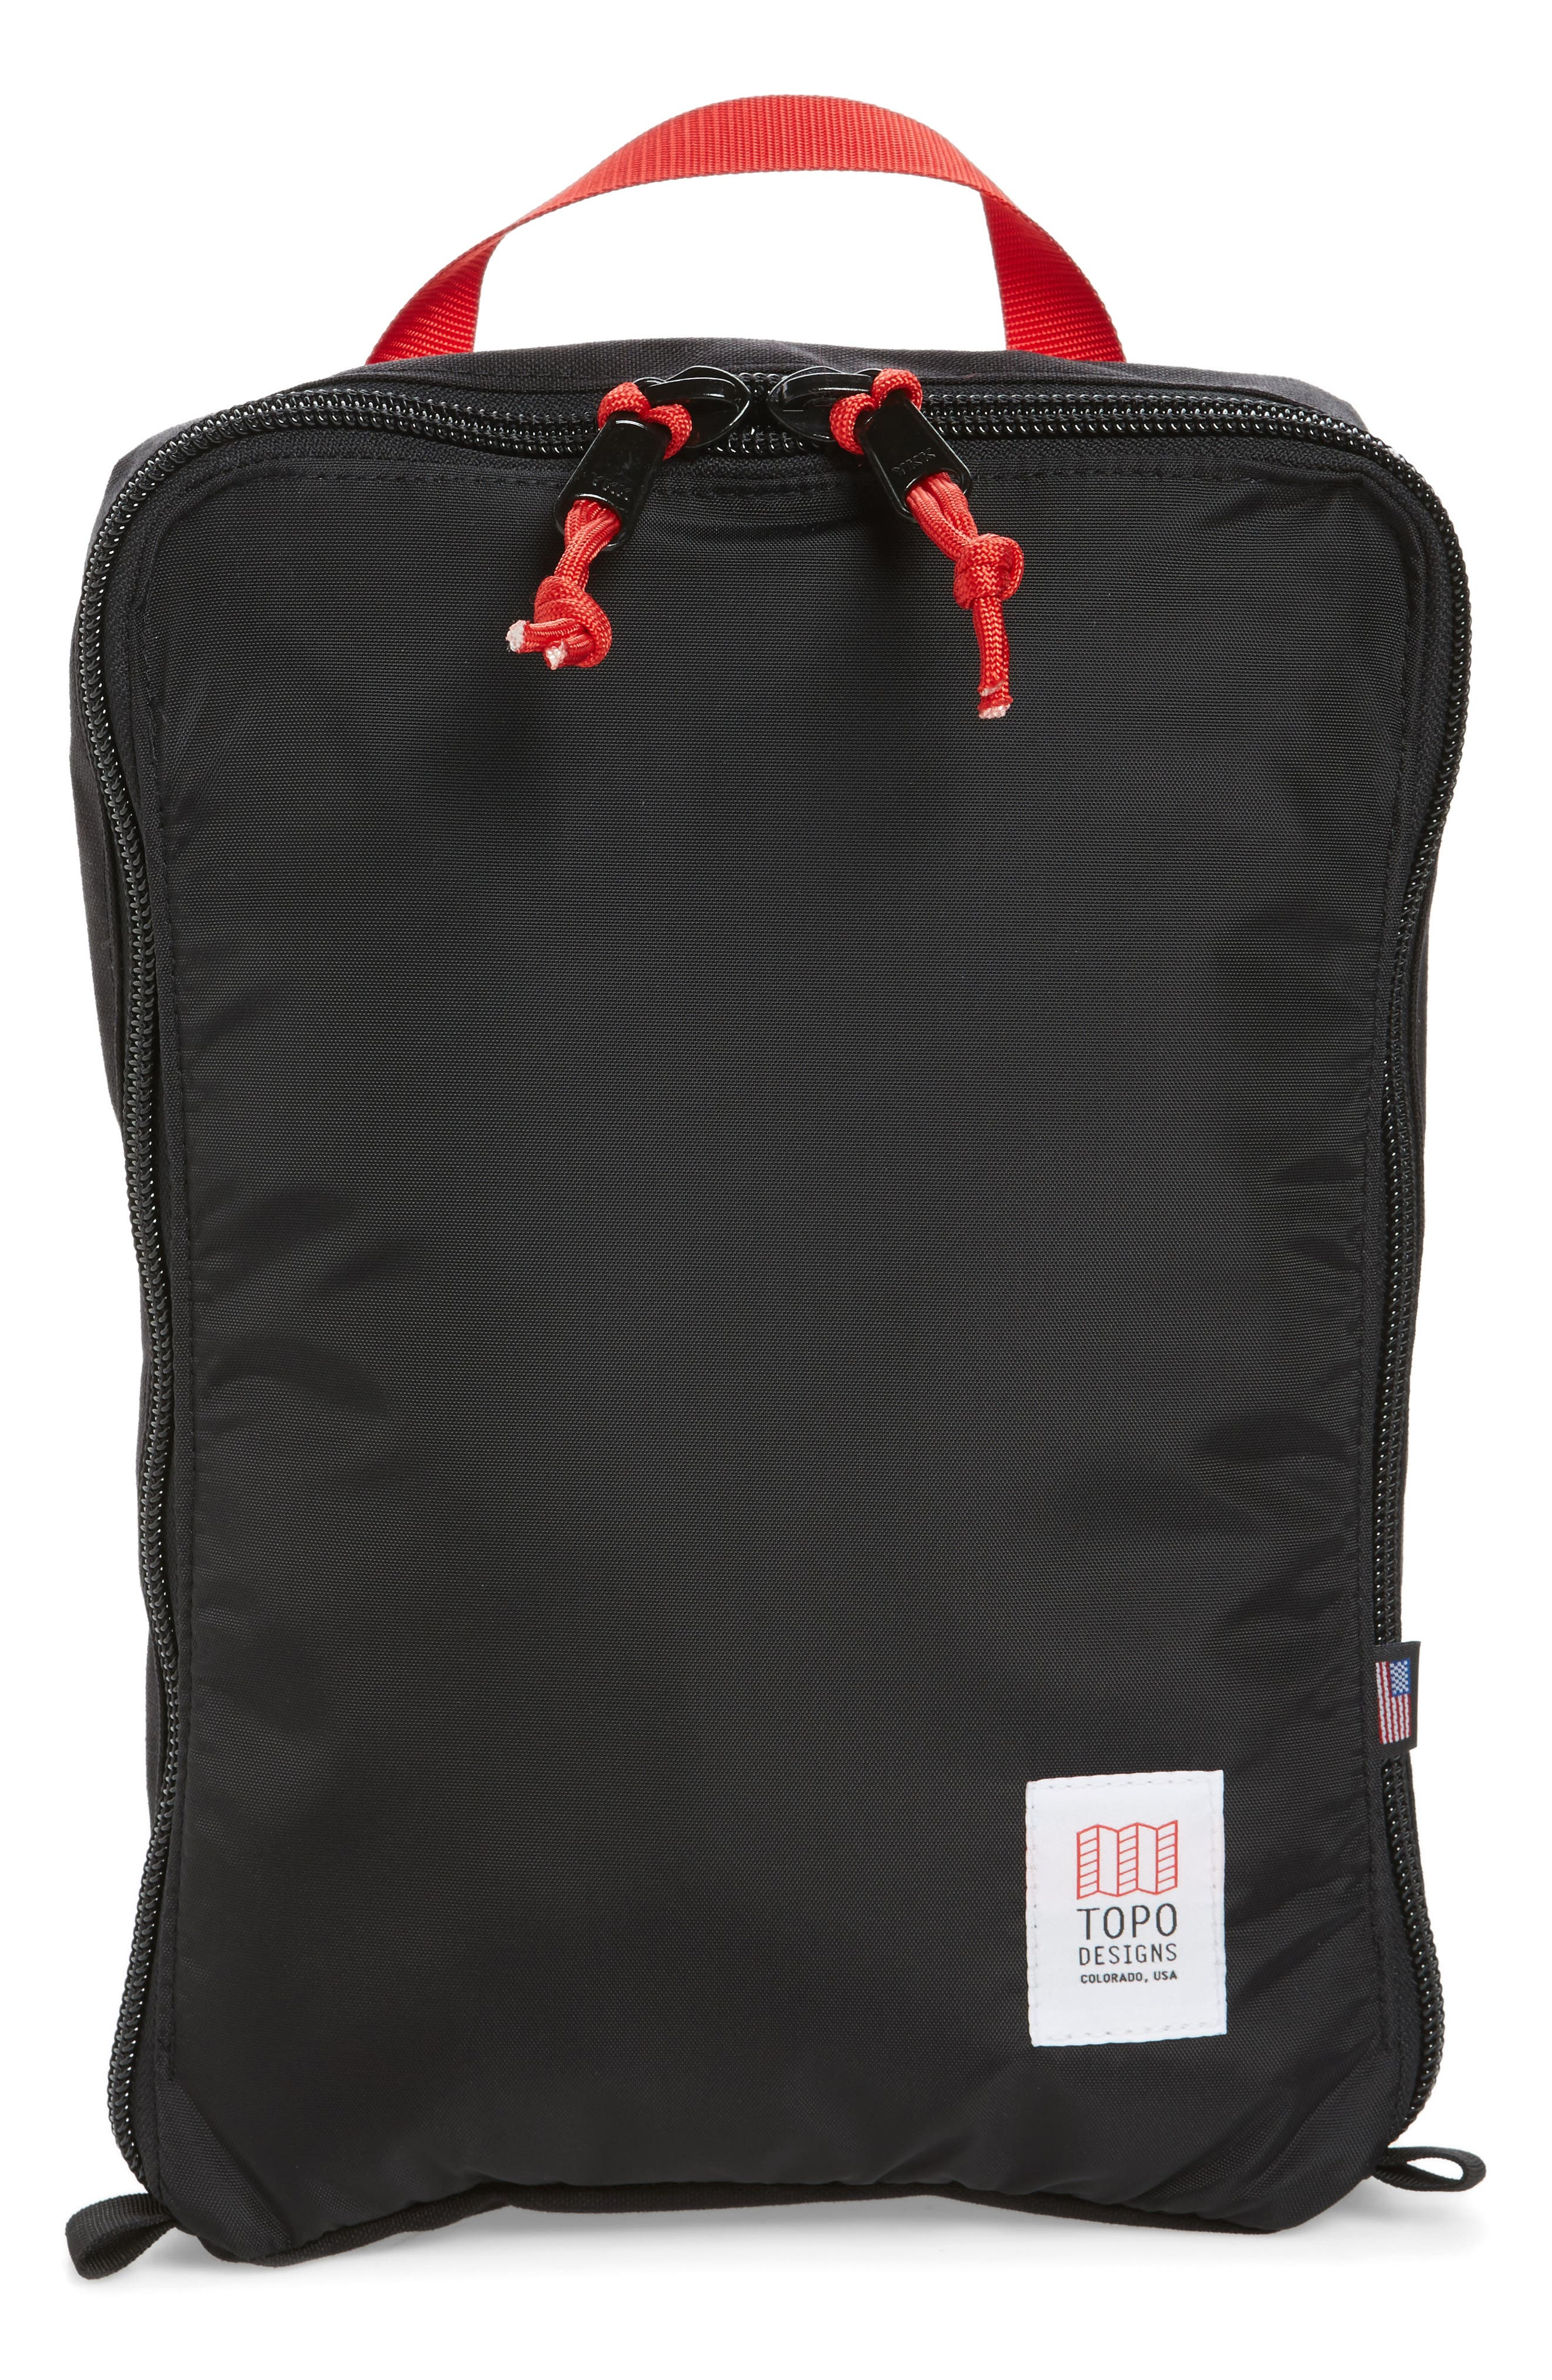 Main Image - Topo Designs Pack Bags Tote